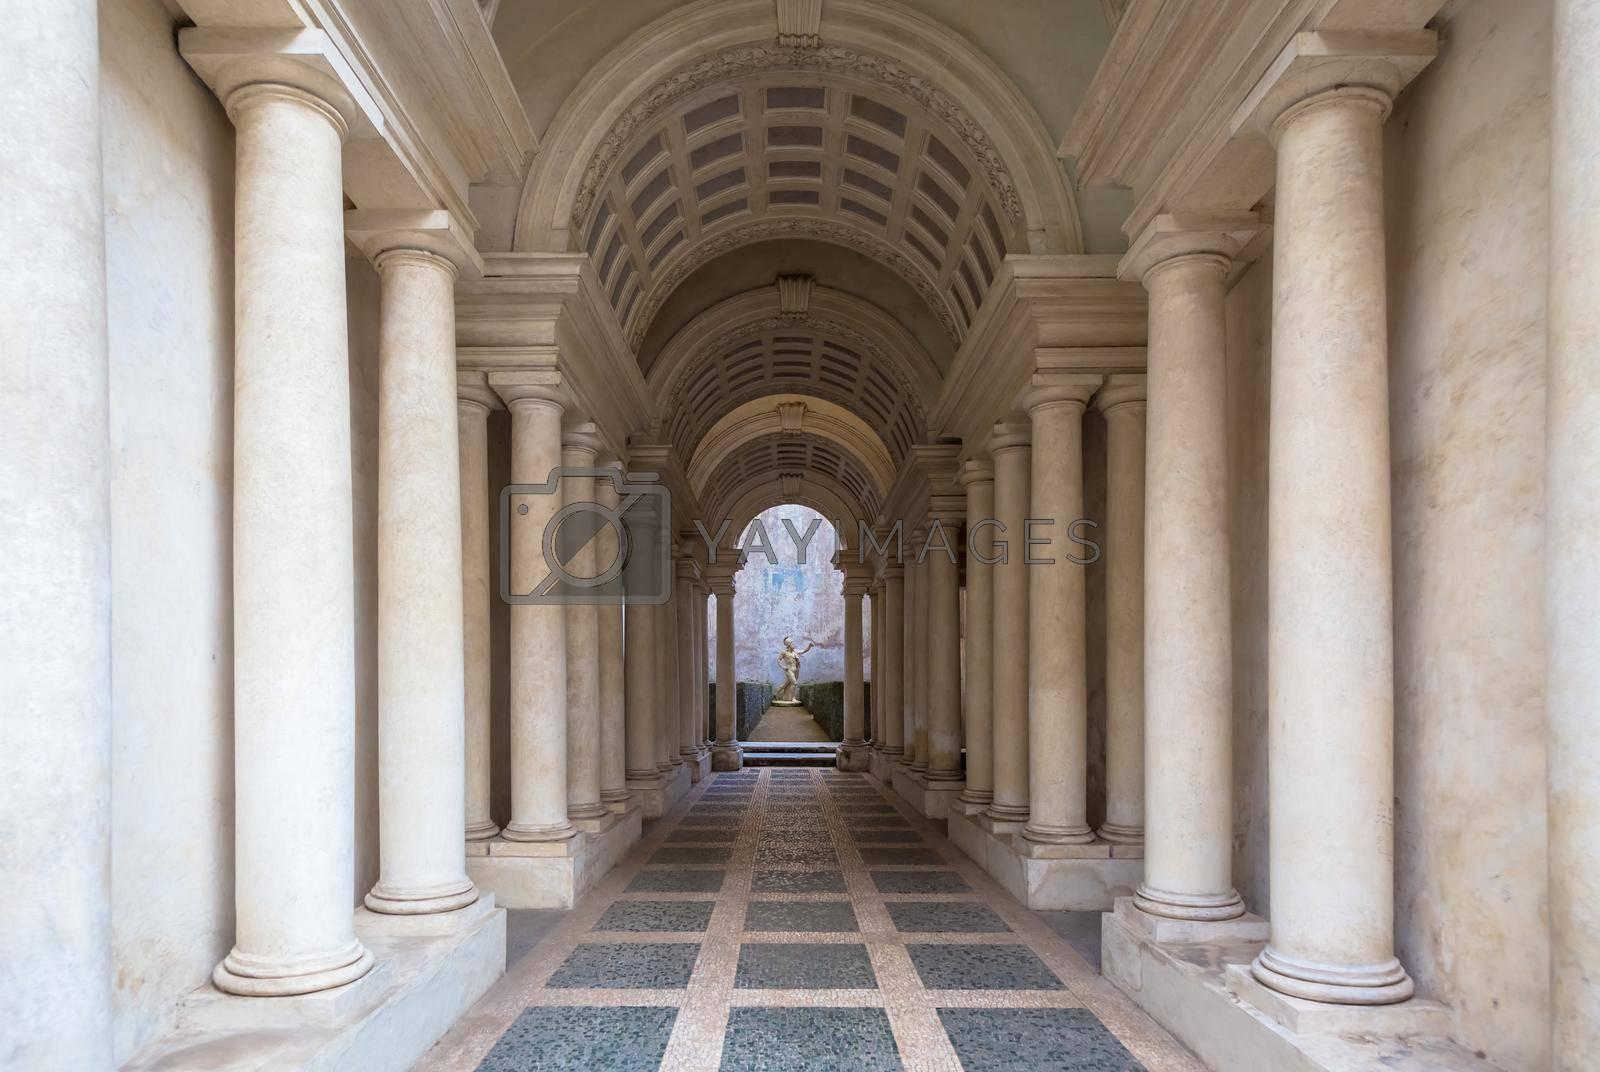 ROME, ITALY - August 23, 2018: Prospettiva Borromini (Borromini Perspective), corridor with marble columns in this luxury palace